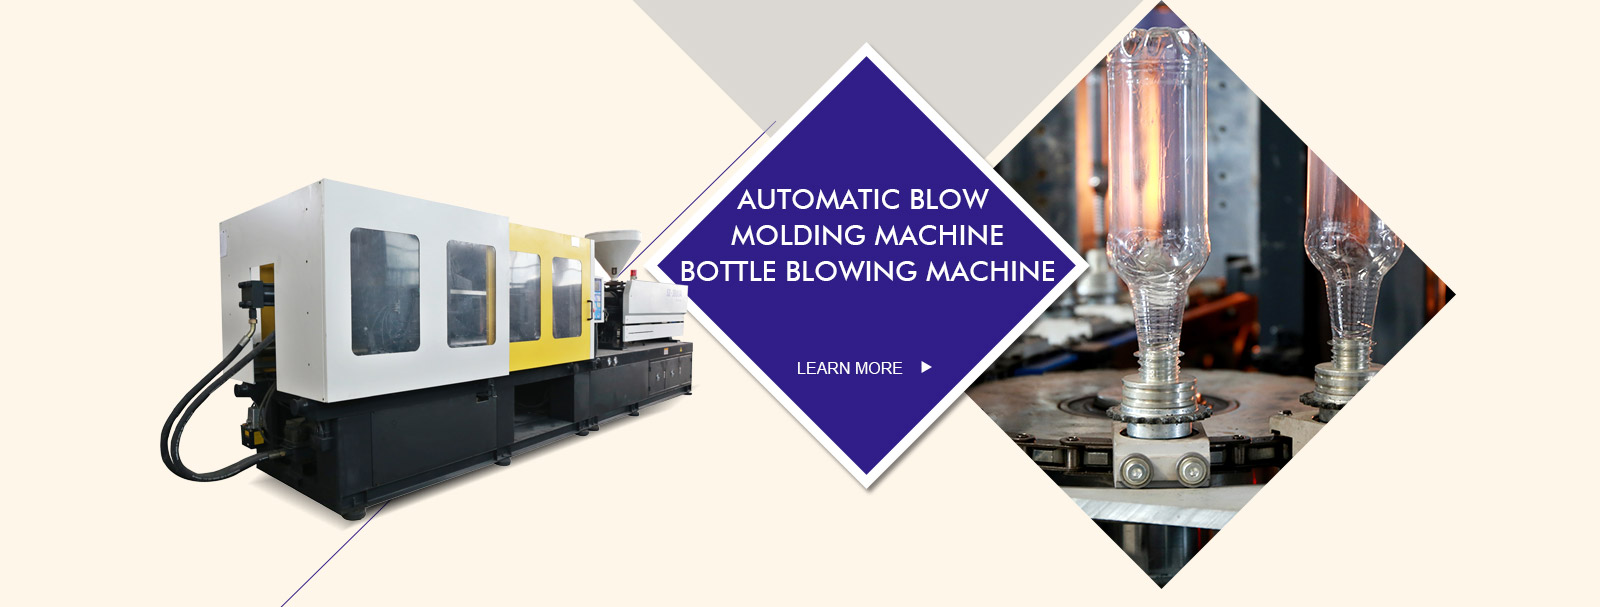 modern-pack bottle blowing machine